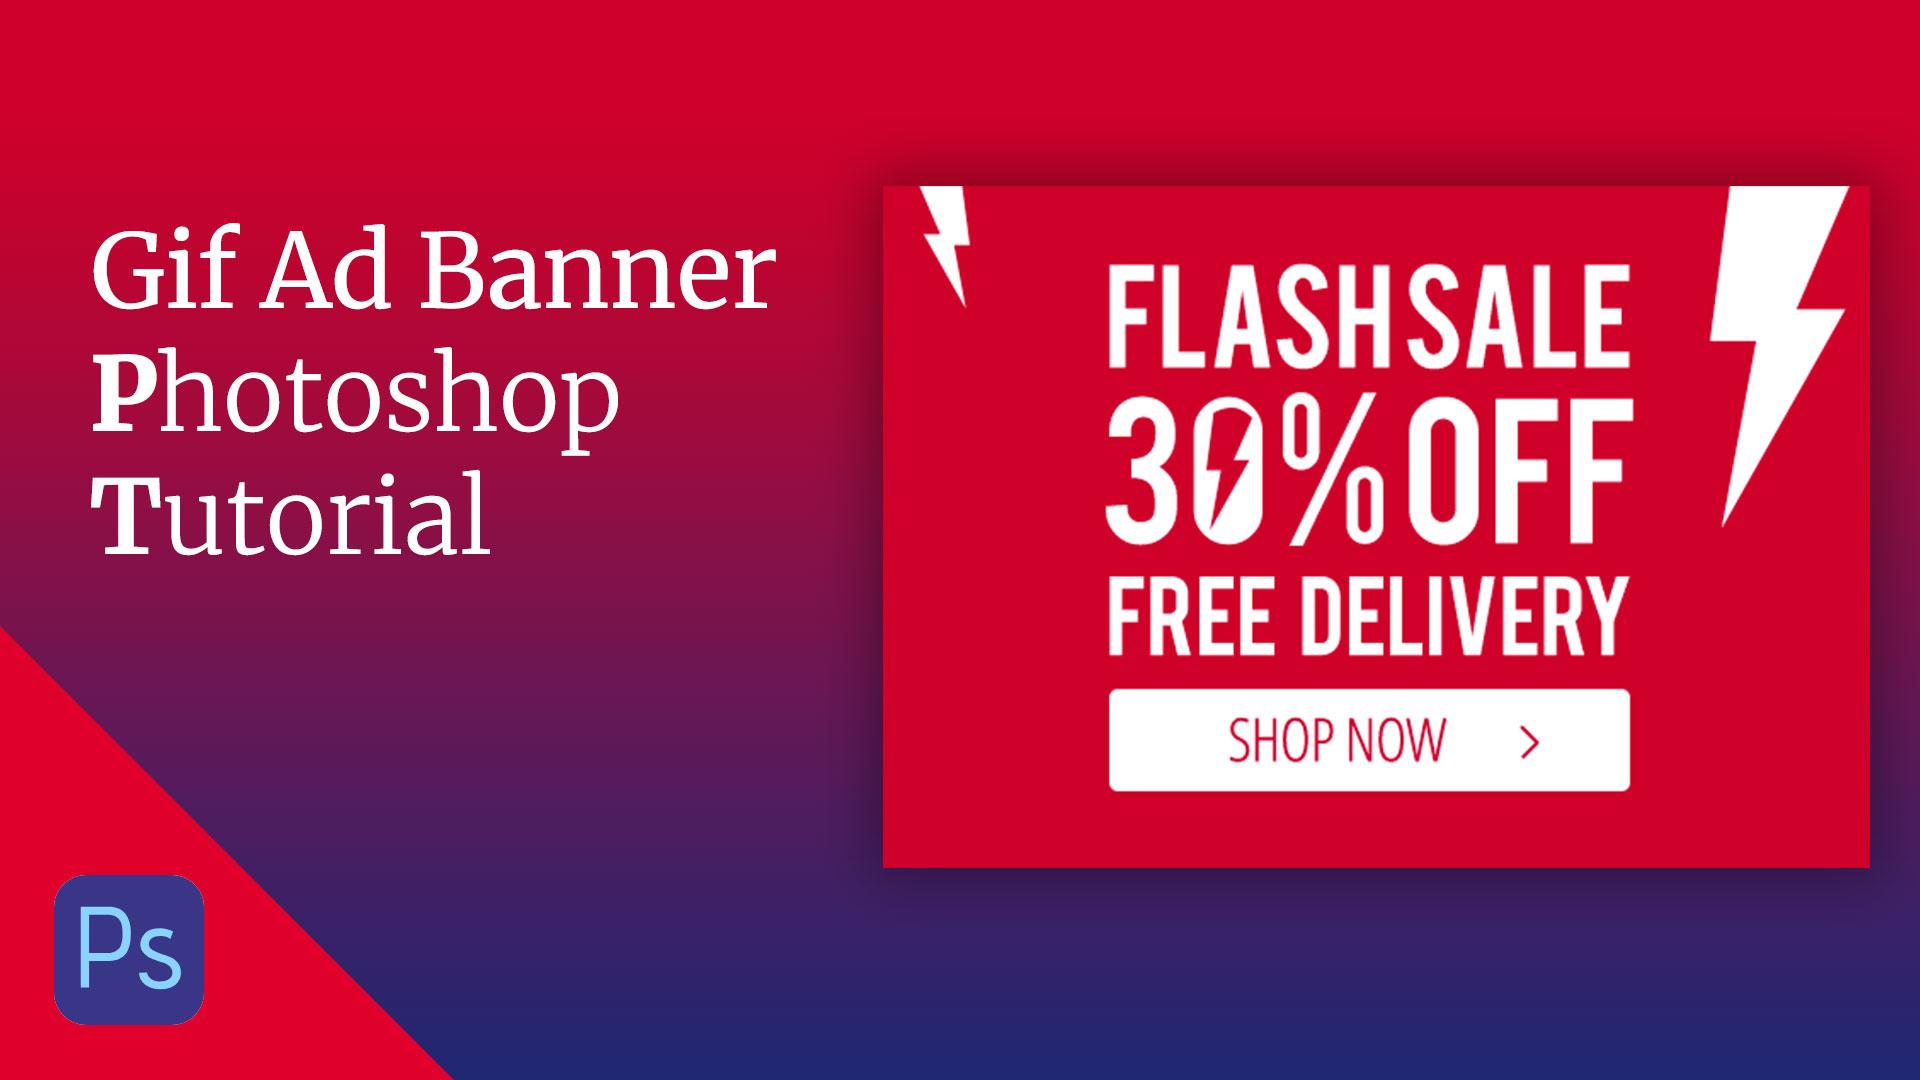 Gif Ad Banner Design & Animation Photoshop Tutorial